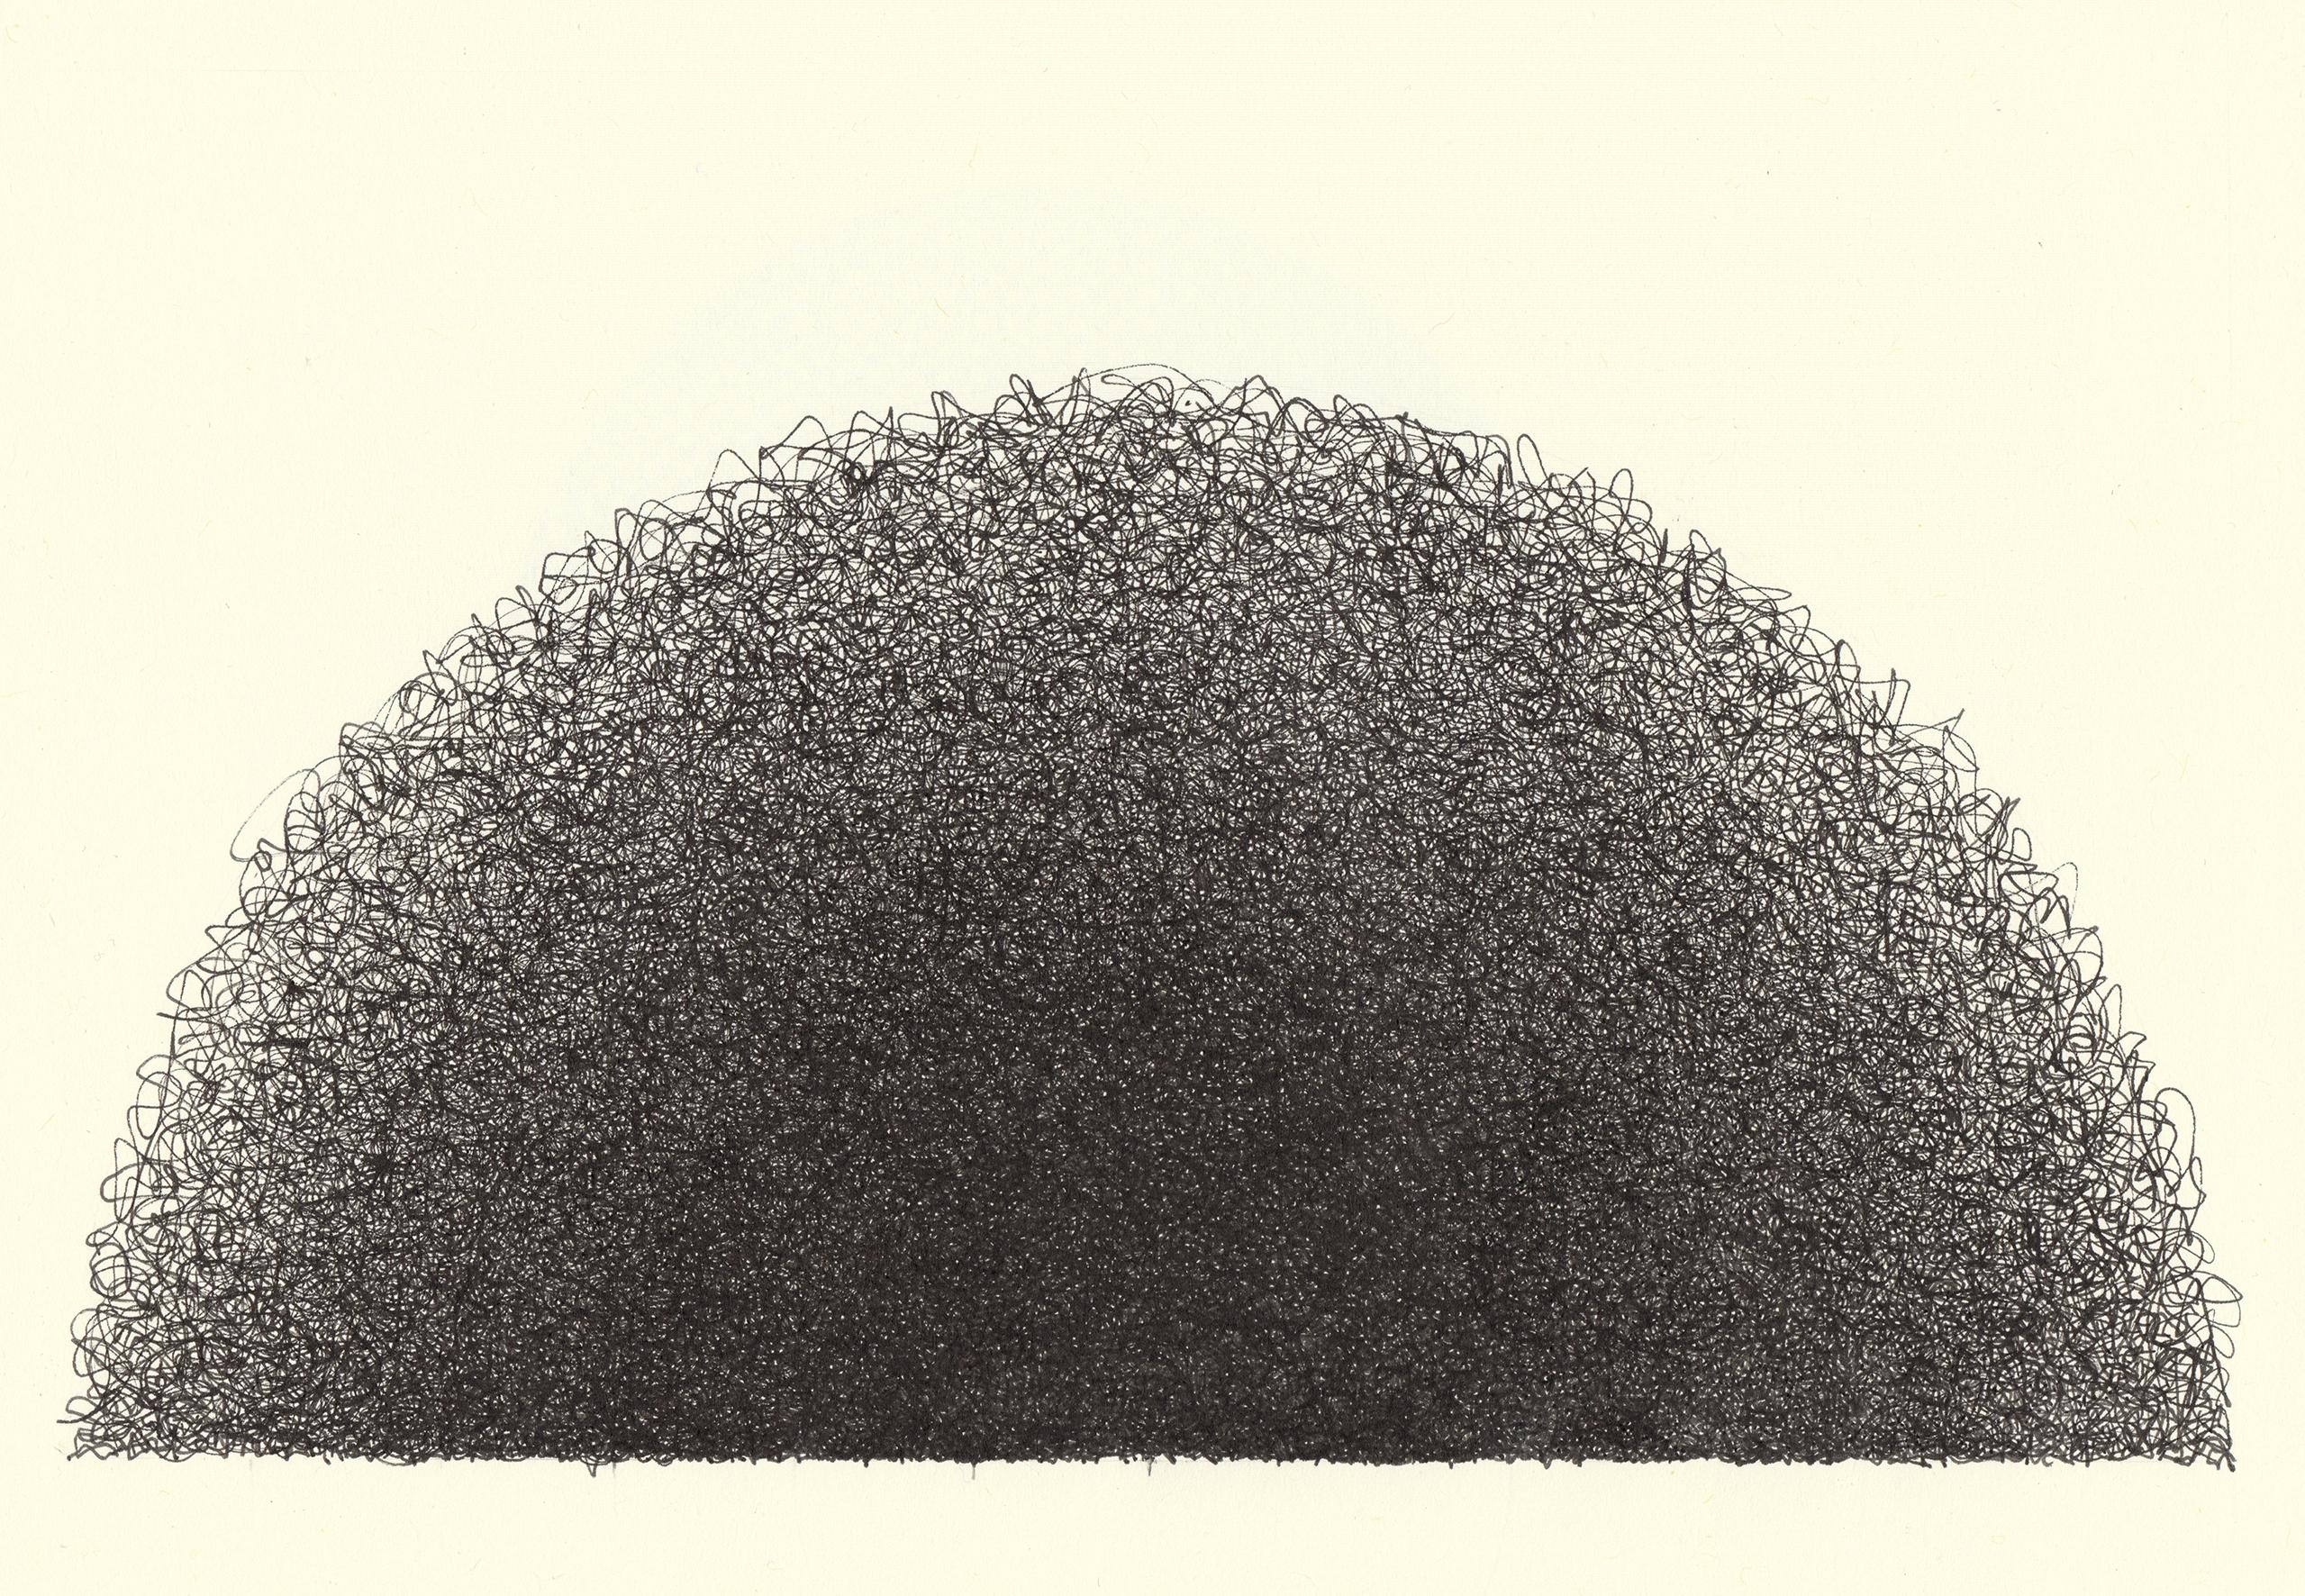 Linee 28 - lines, blacklines, linework - danilo_dg | ello